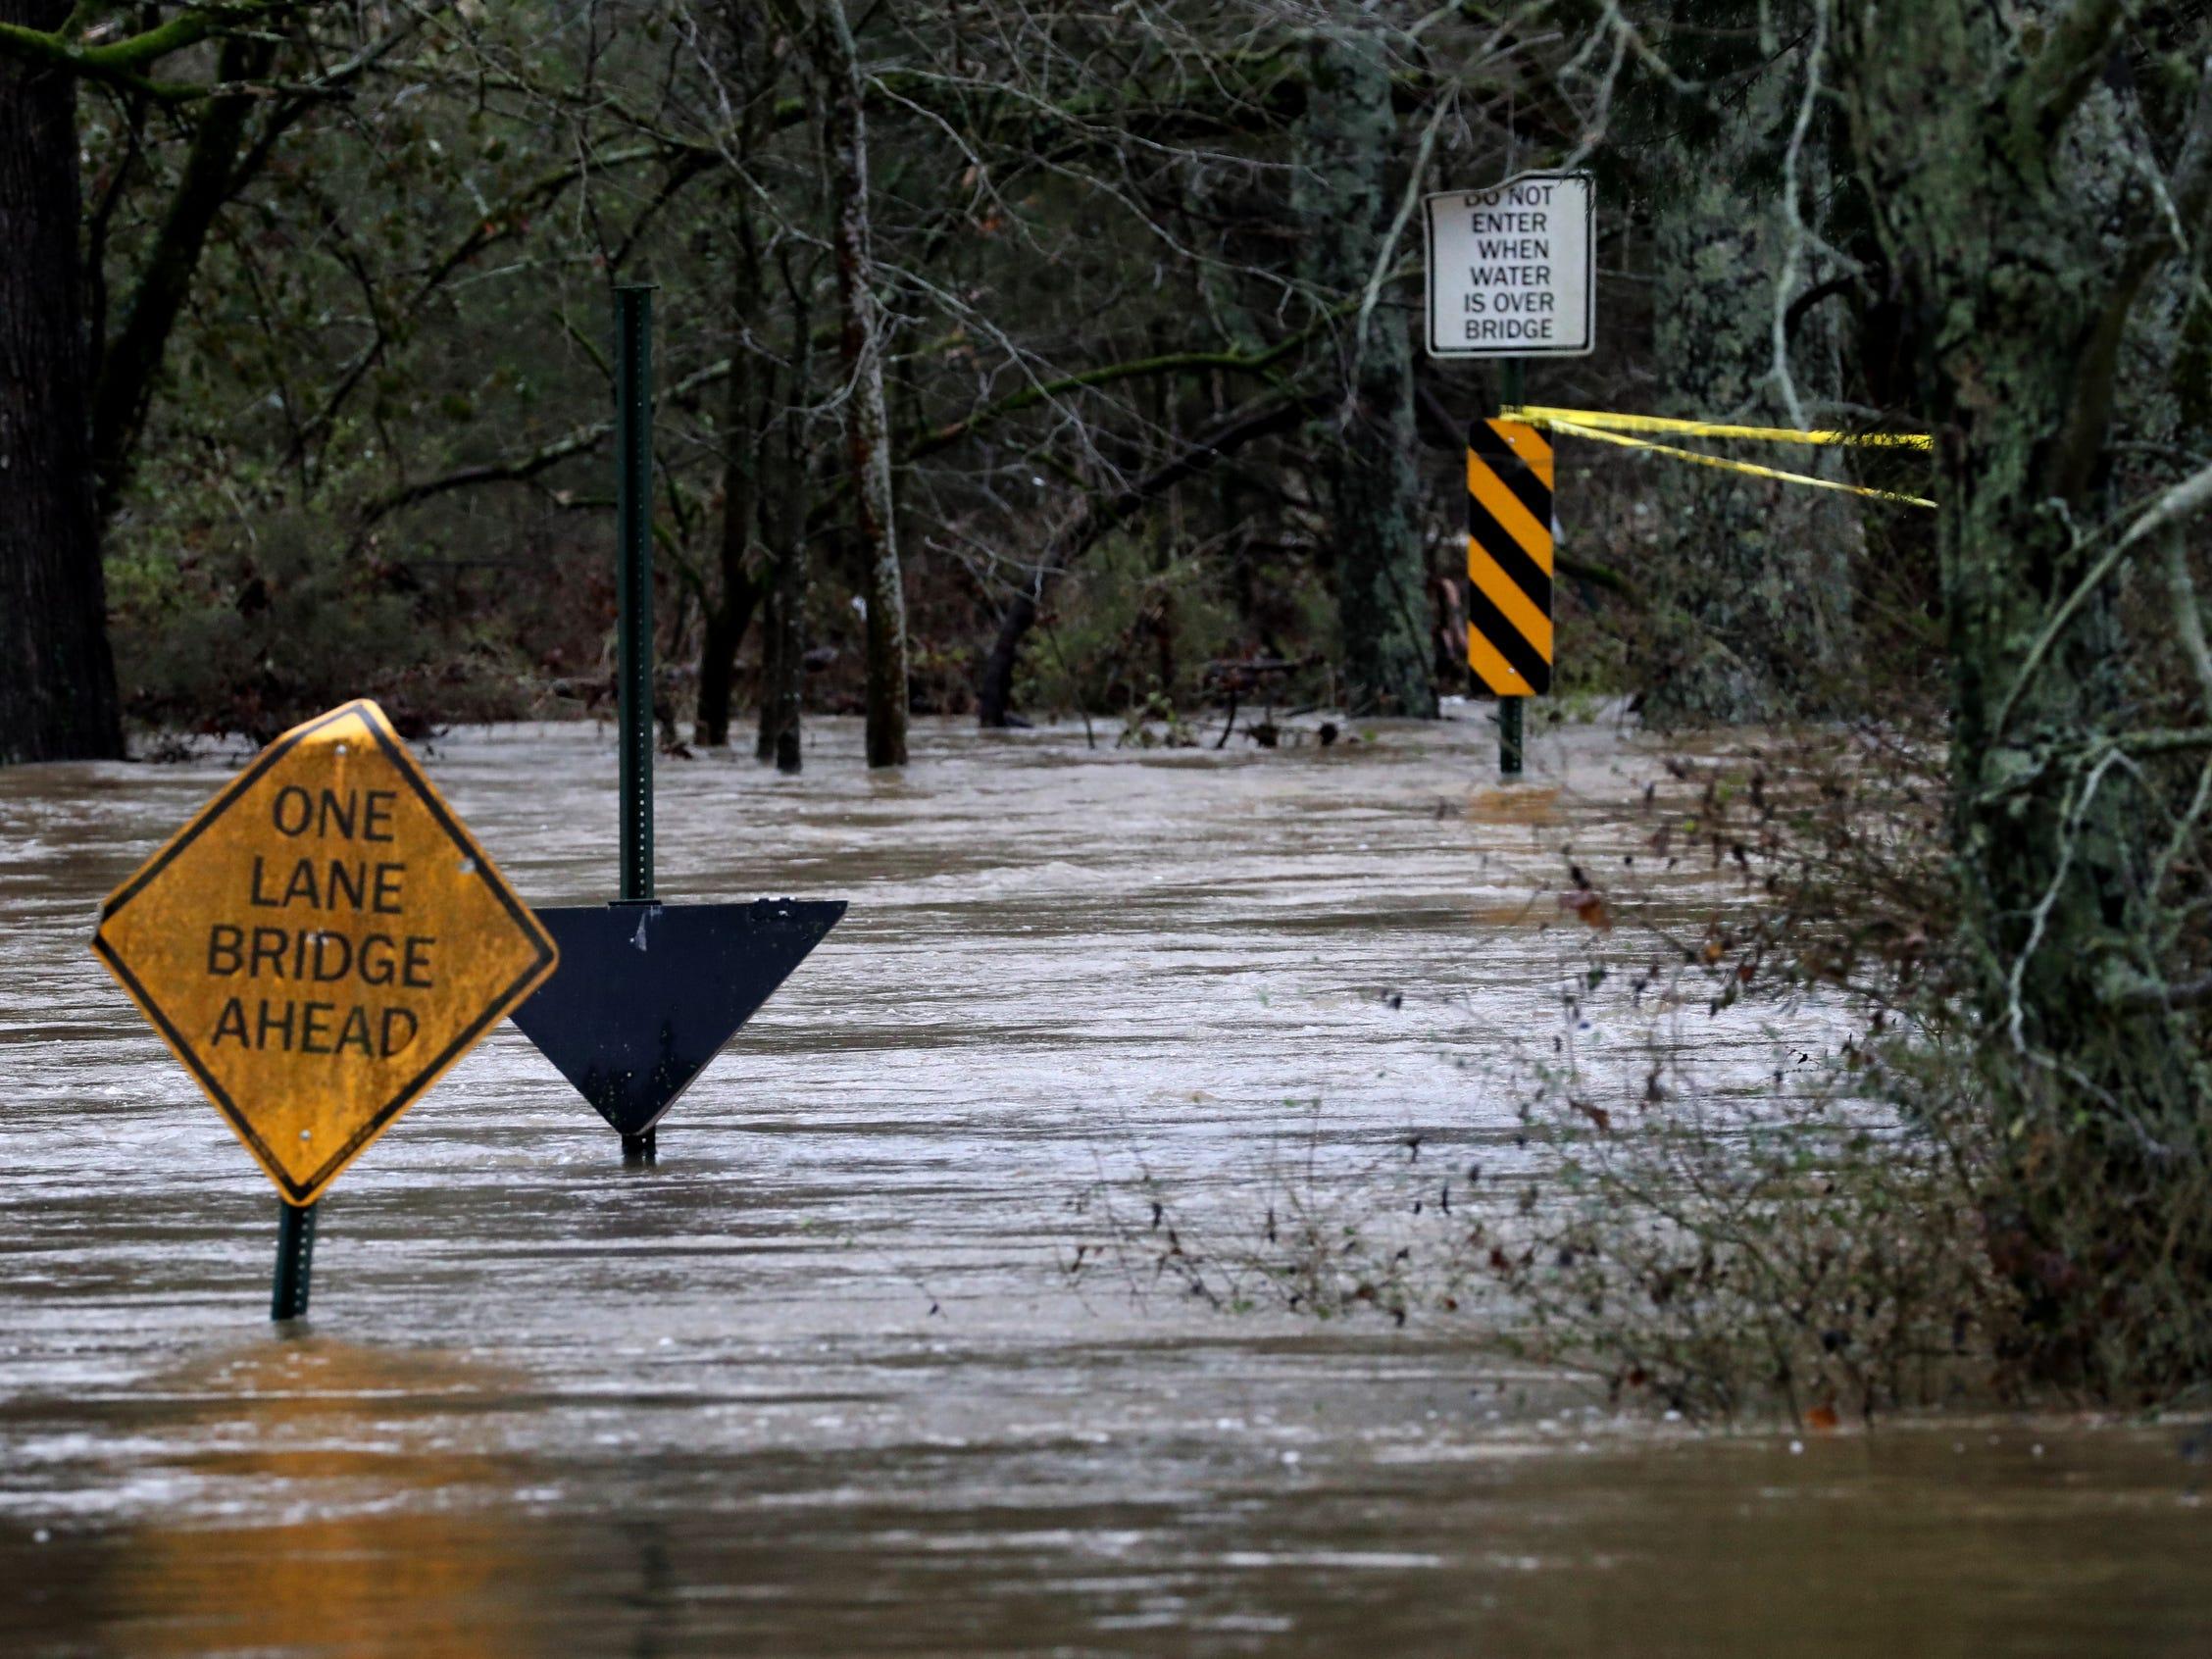 The Slab Bridge at County Farm Road is impassible in Murfreesboro on Saturday, Feb. 23, 2019.